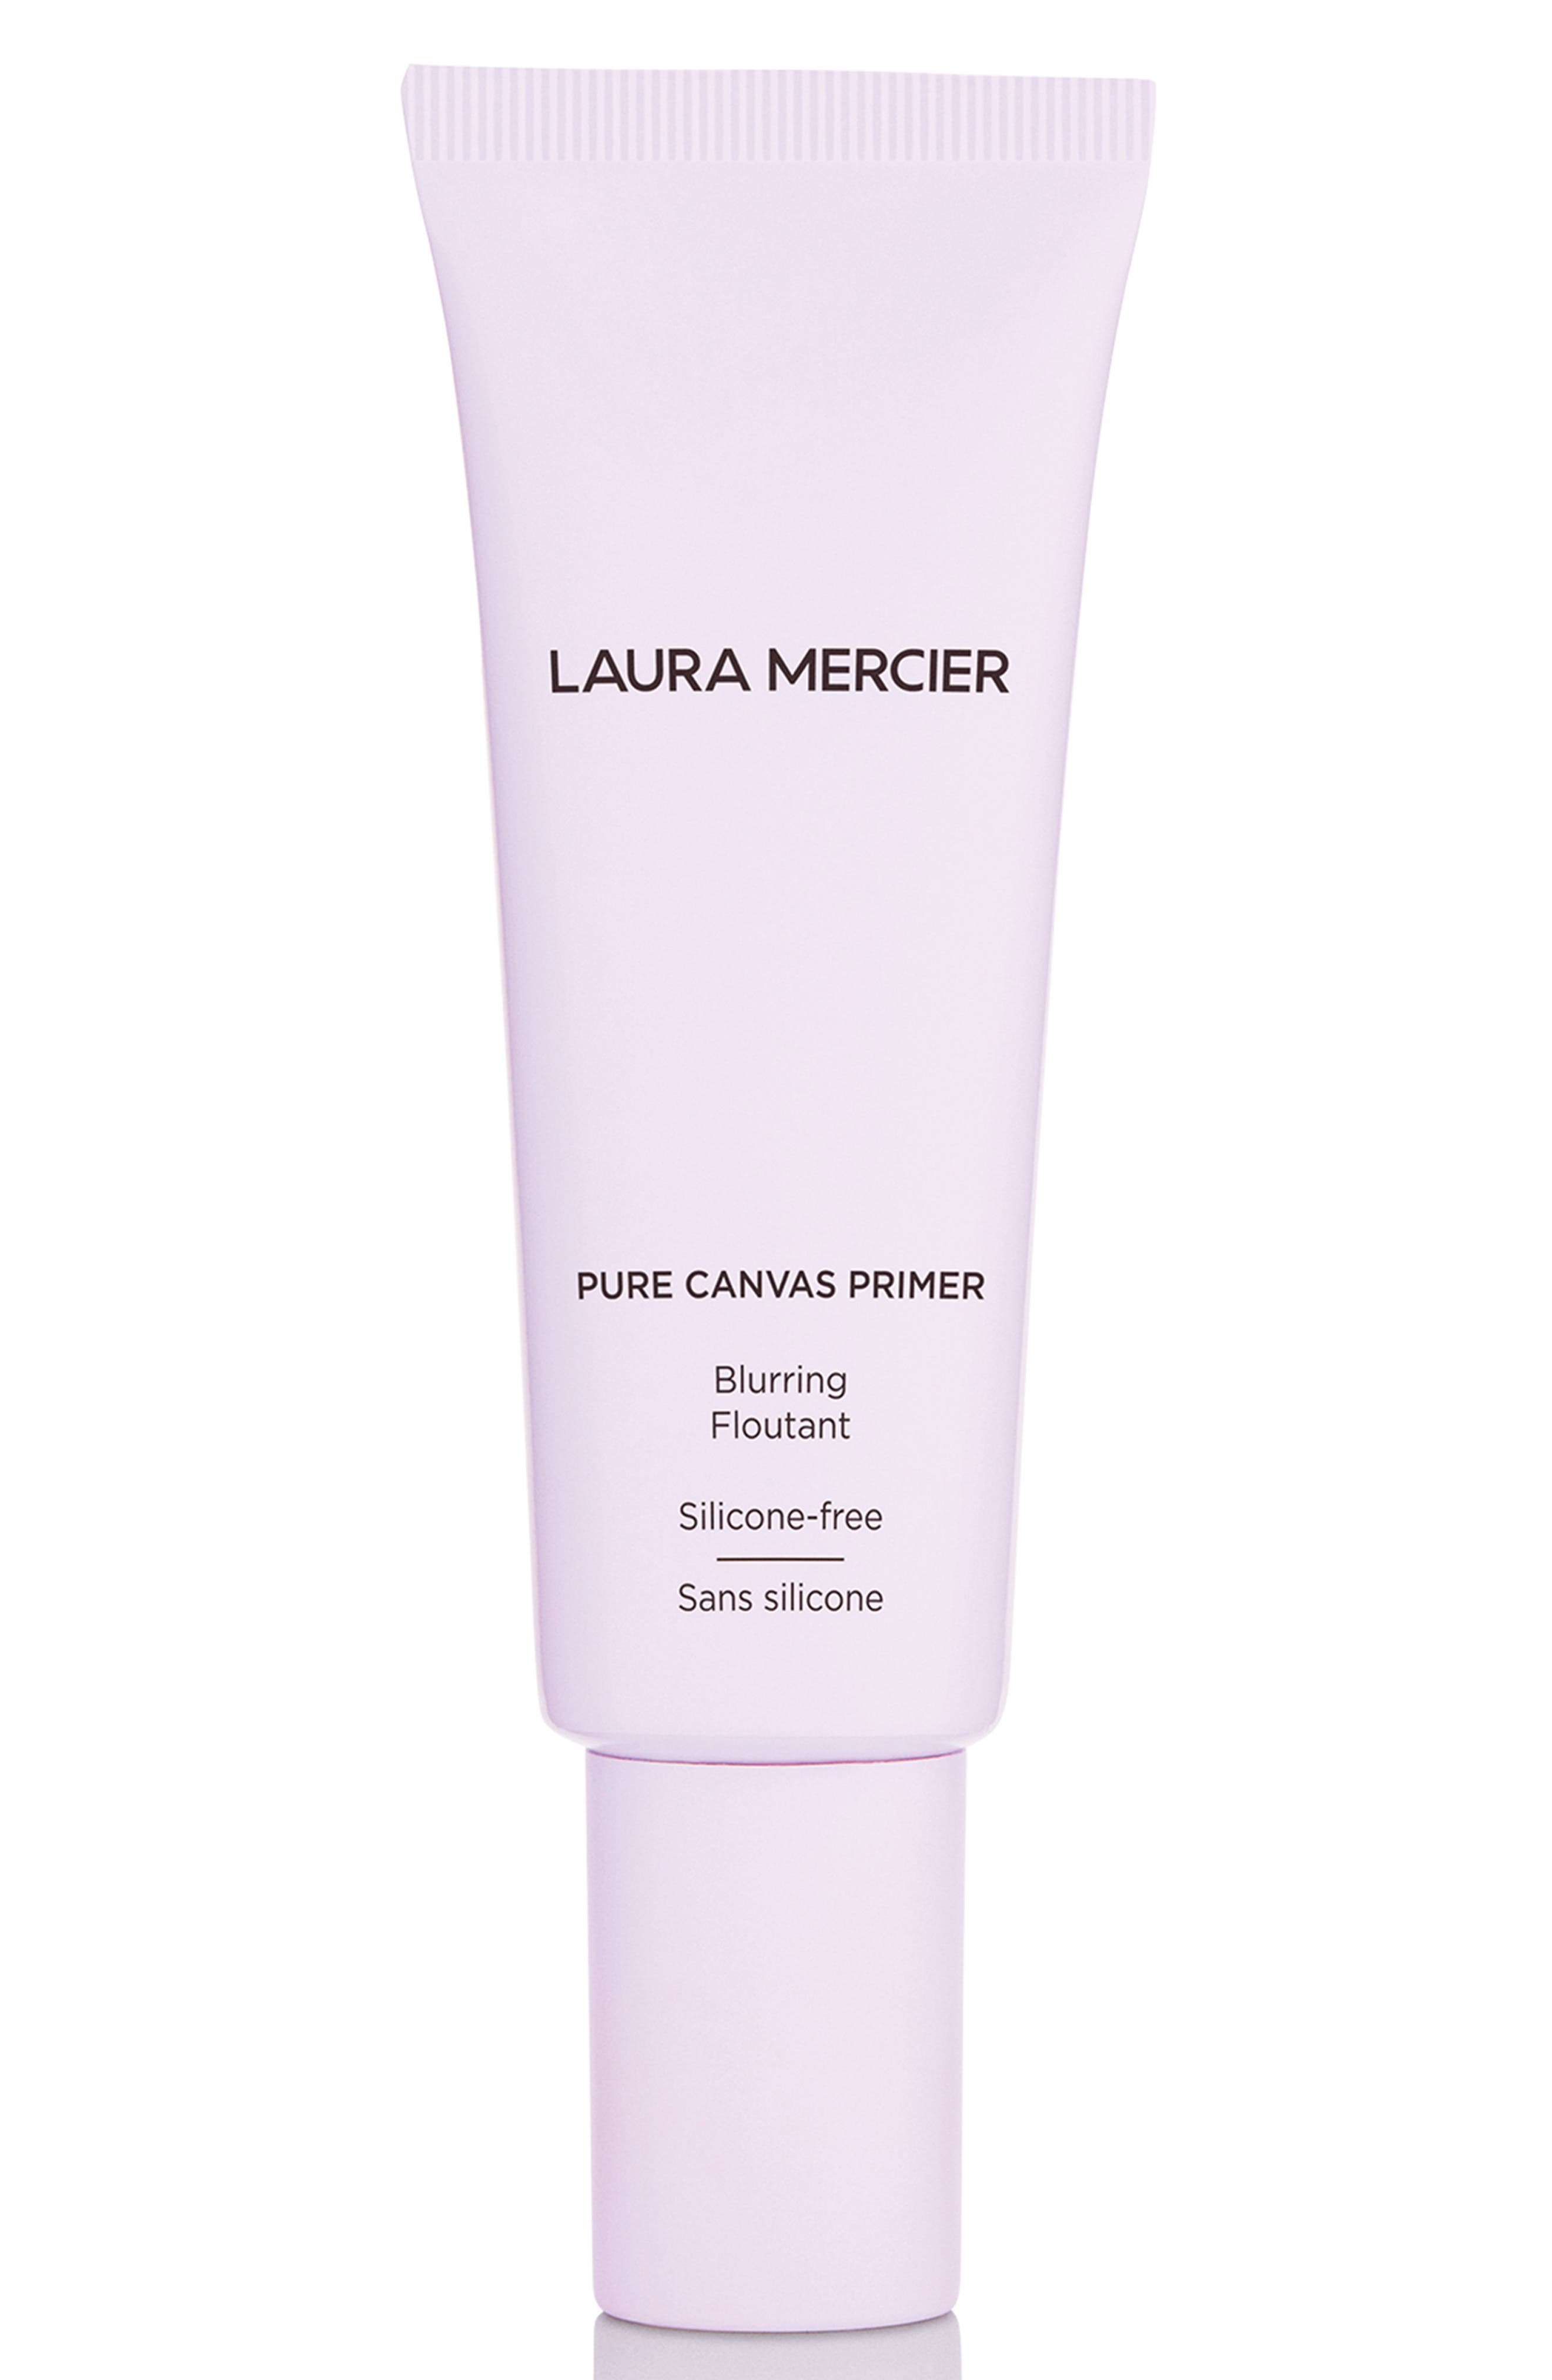 Image of Laura Mercier Pure Canvas Primer Mini - Blurring